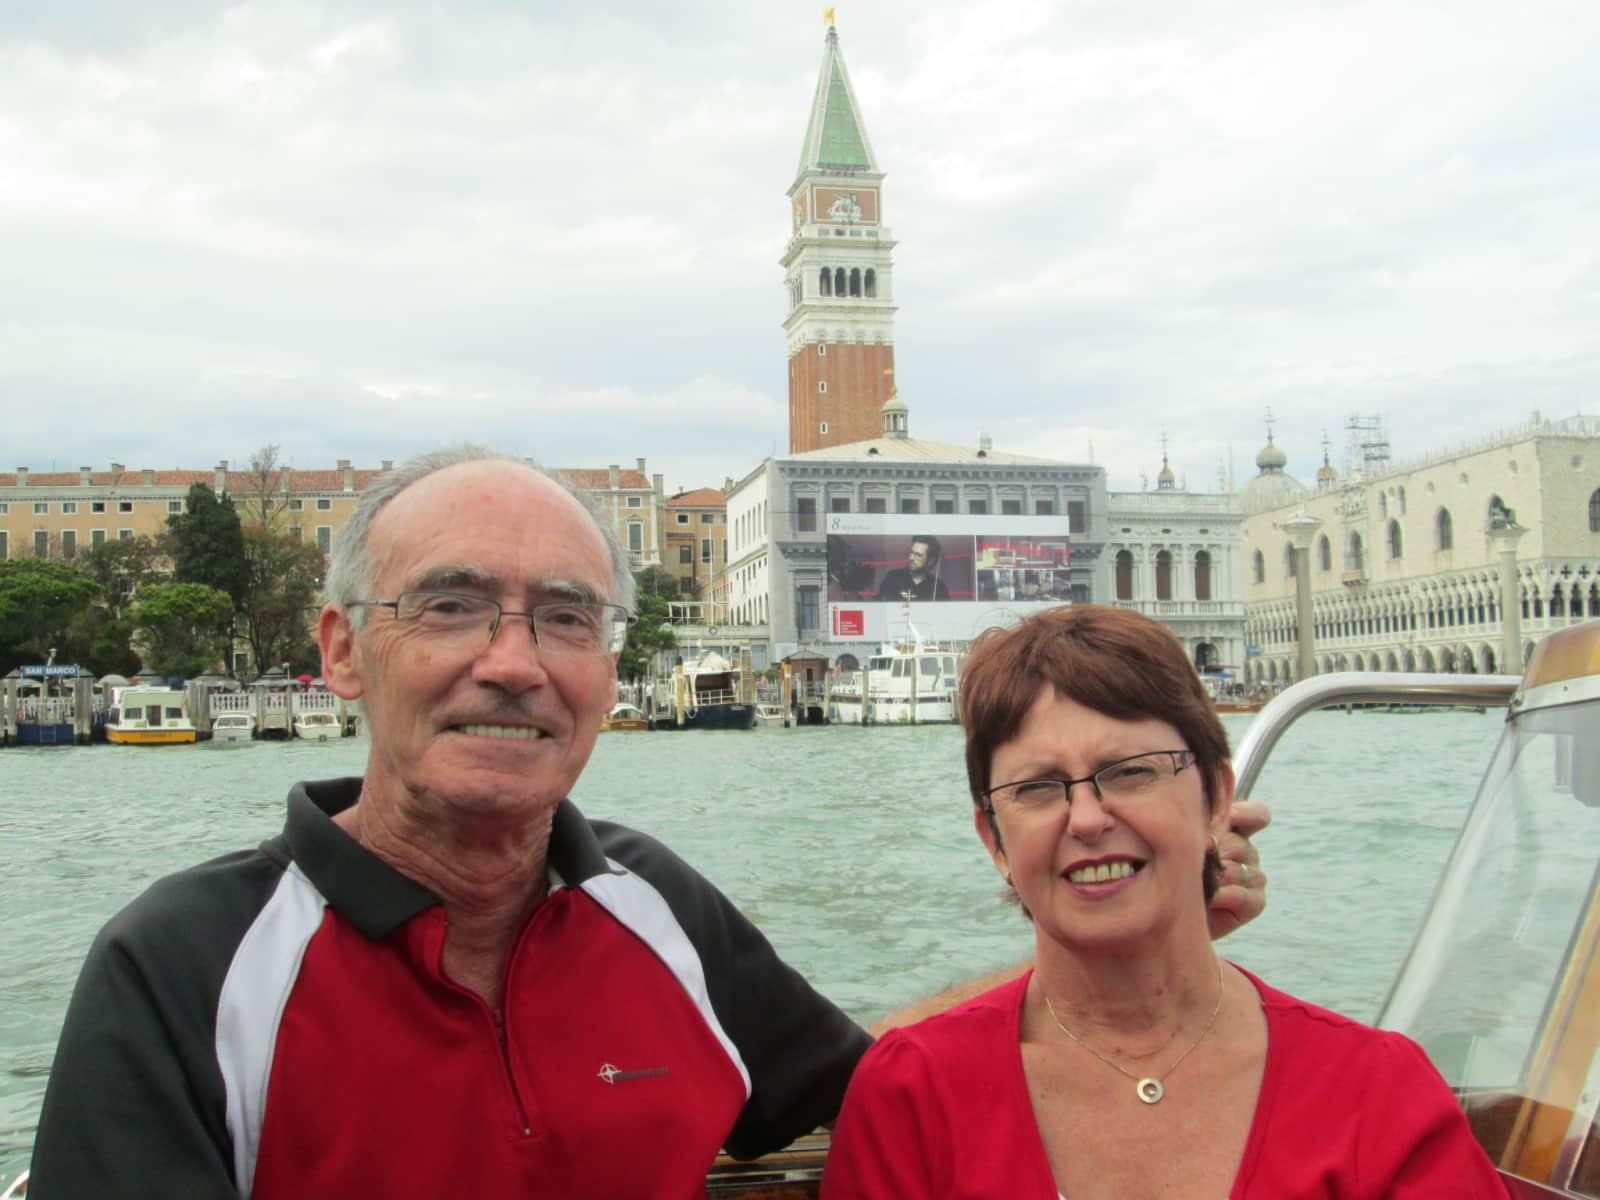 Janet & Dayrell from Tauranga, New Zealand